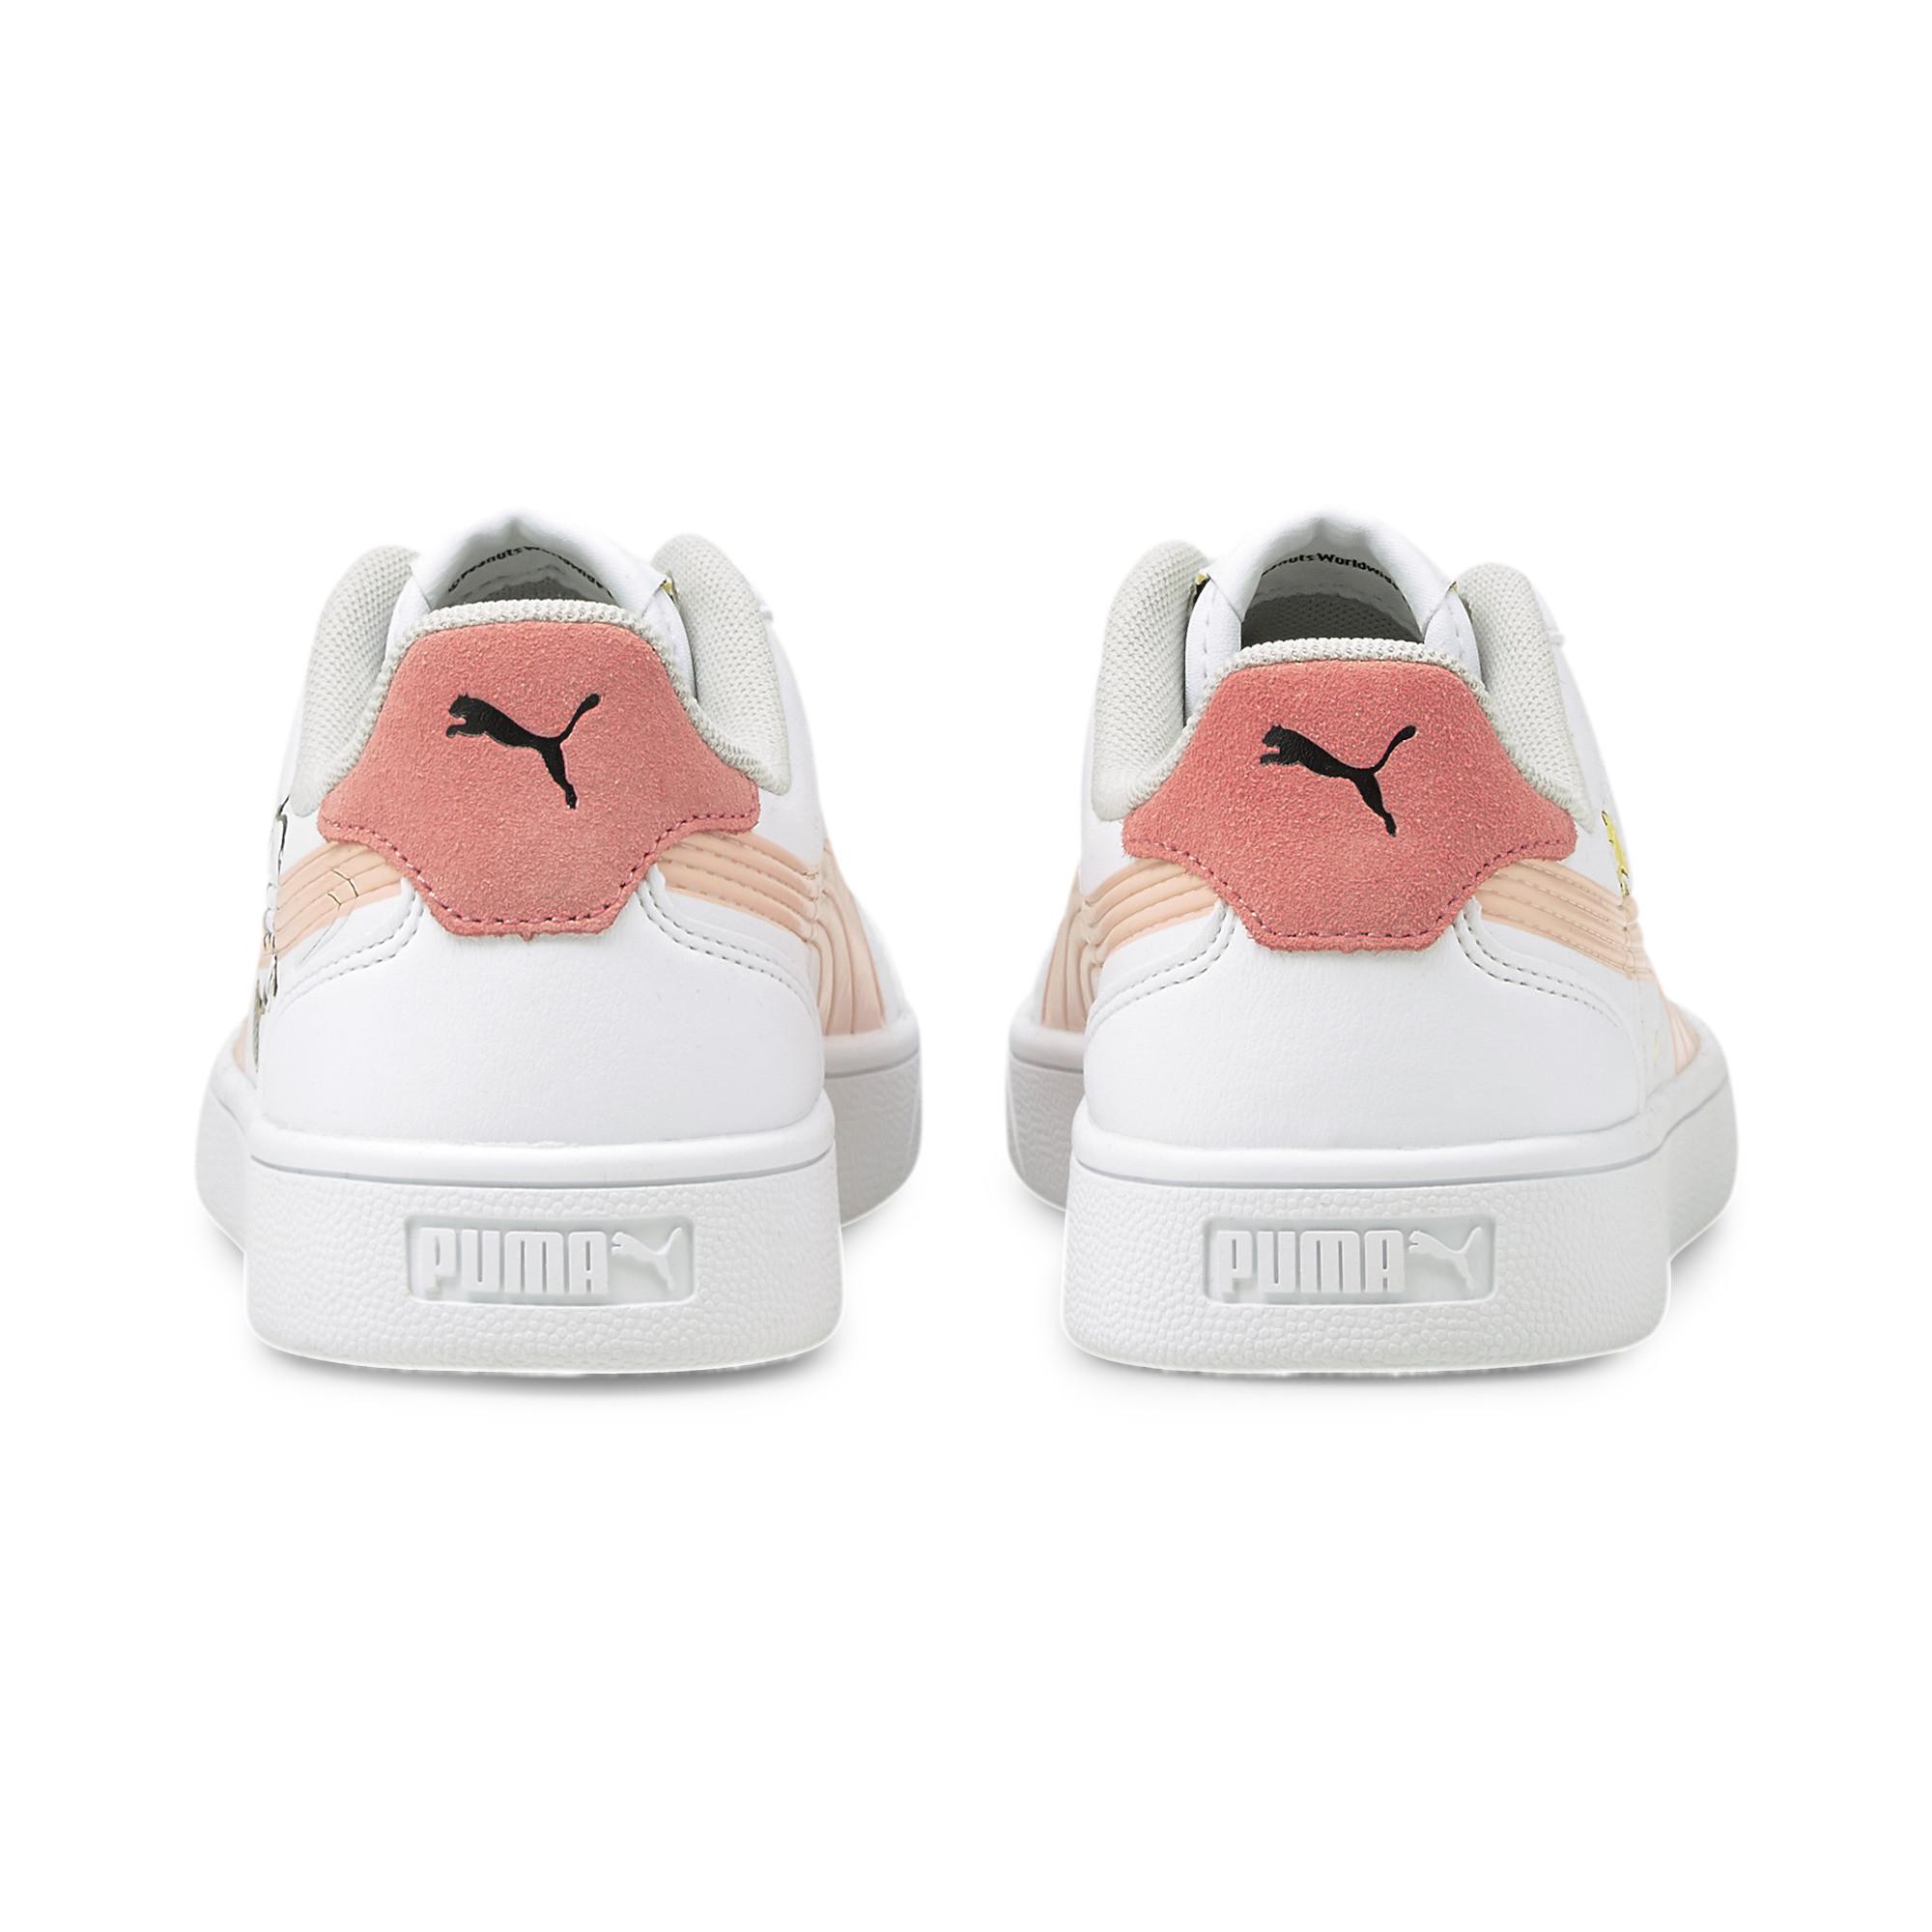 Peanuts x Puma Kids Puma Shuffle ピーナッツ x プーマ キッズ プーマ シャッフル 色:White-Apricot-SCoral-Black